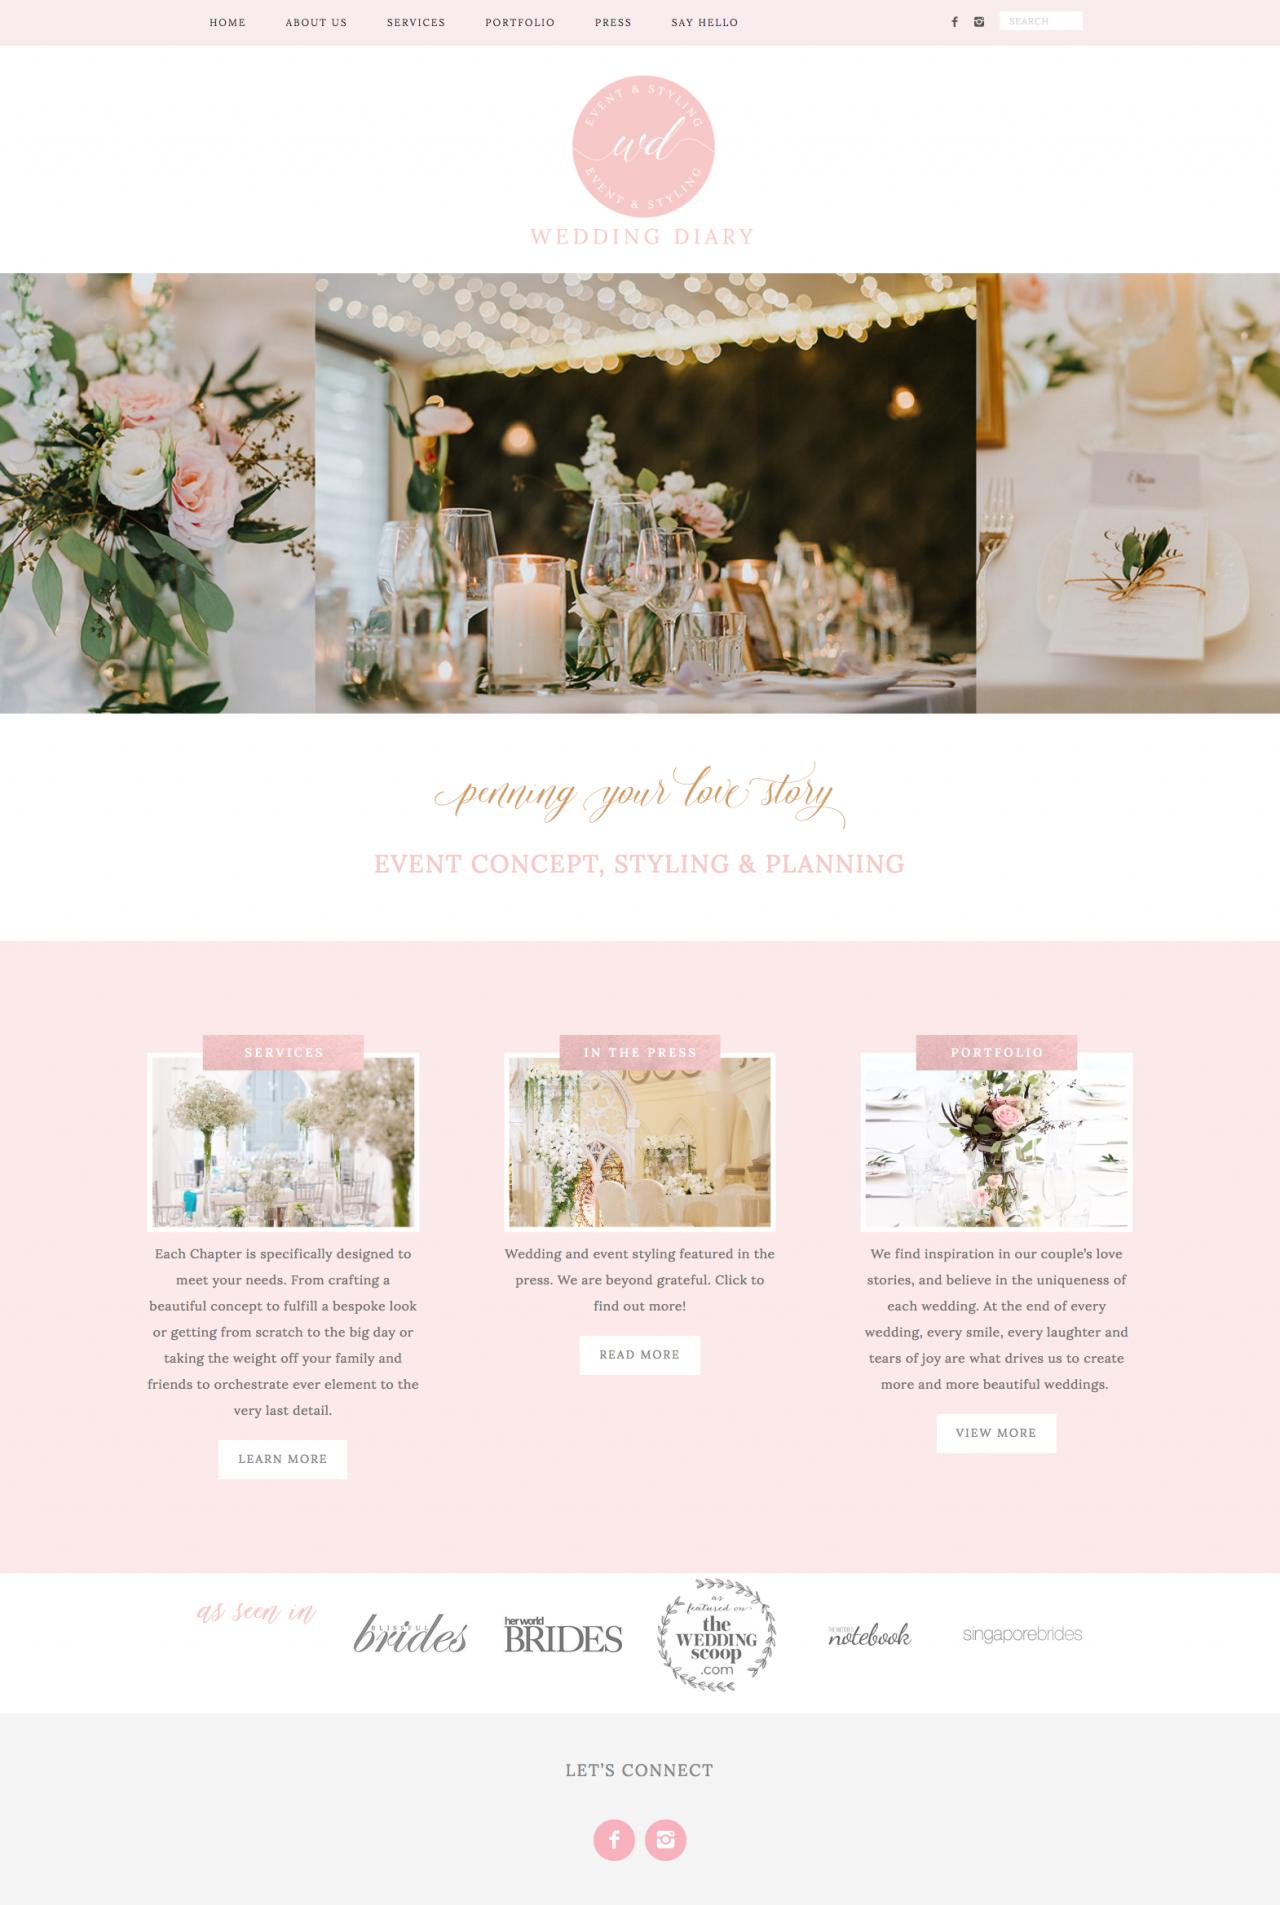 screencapture-weddingdiary-sg-1475157217358